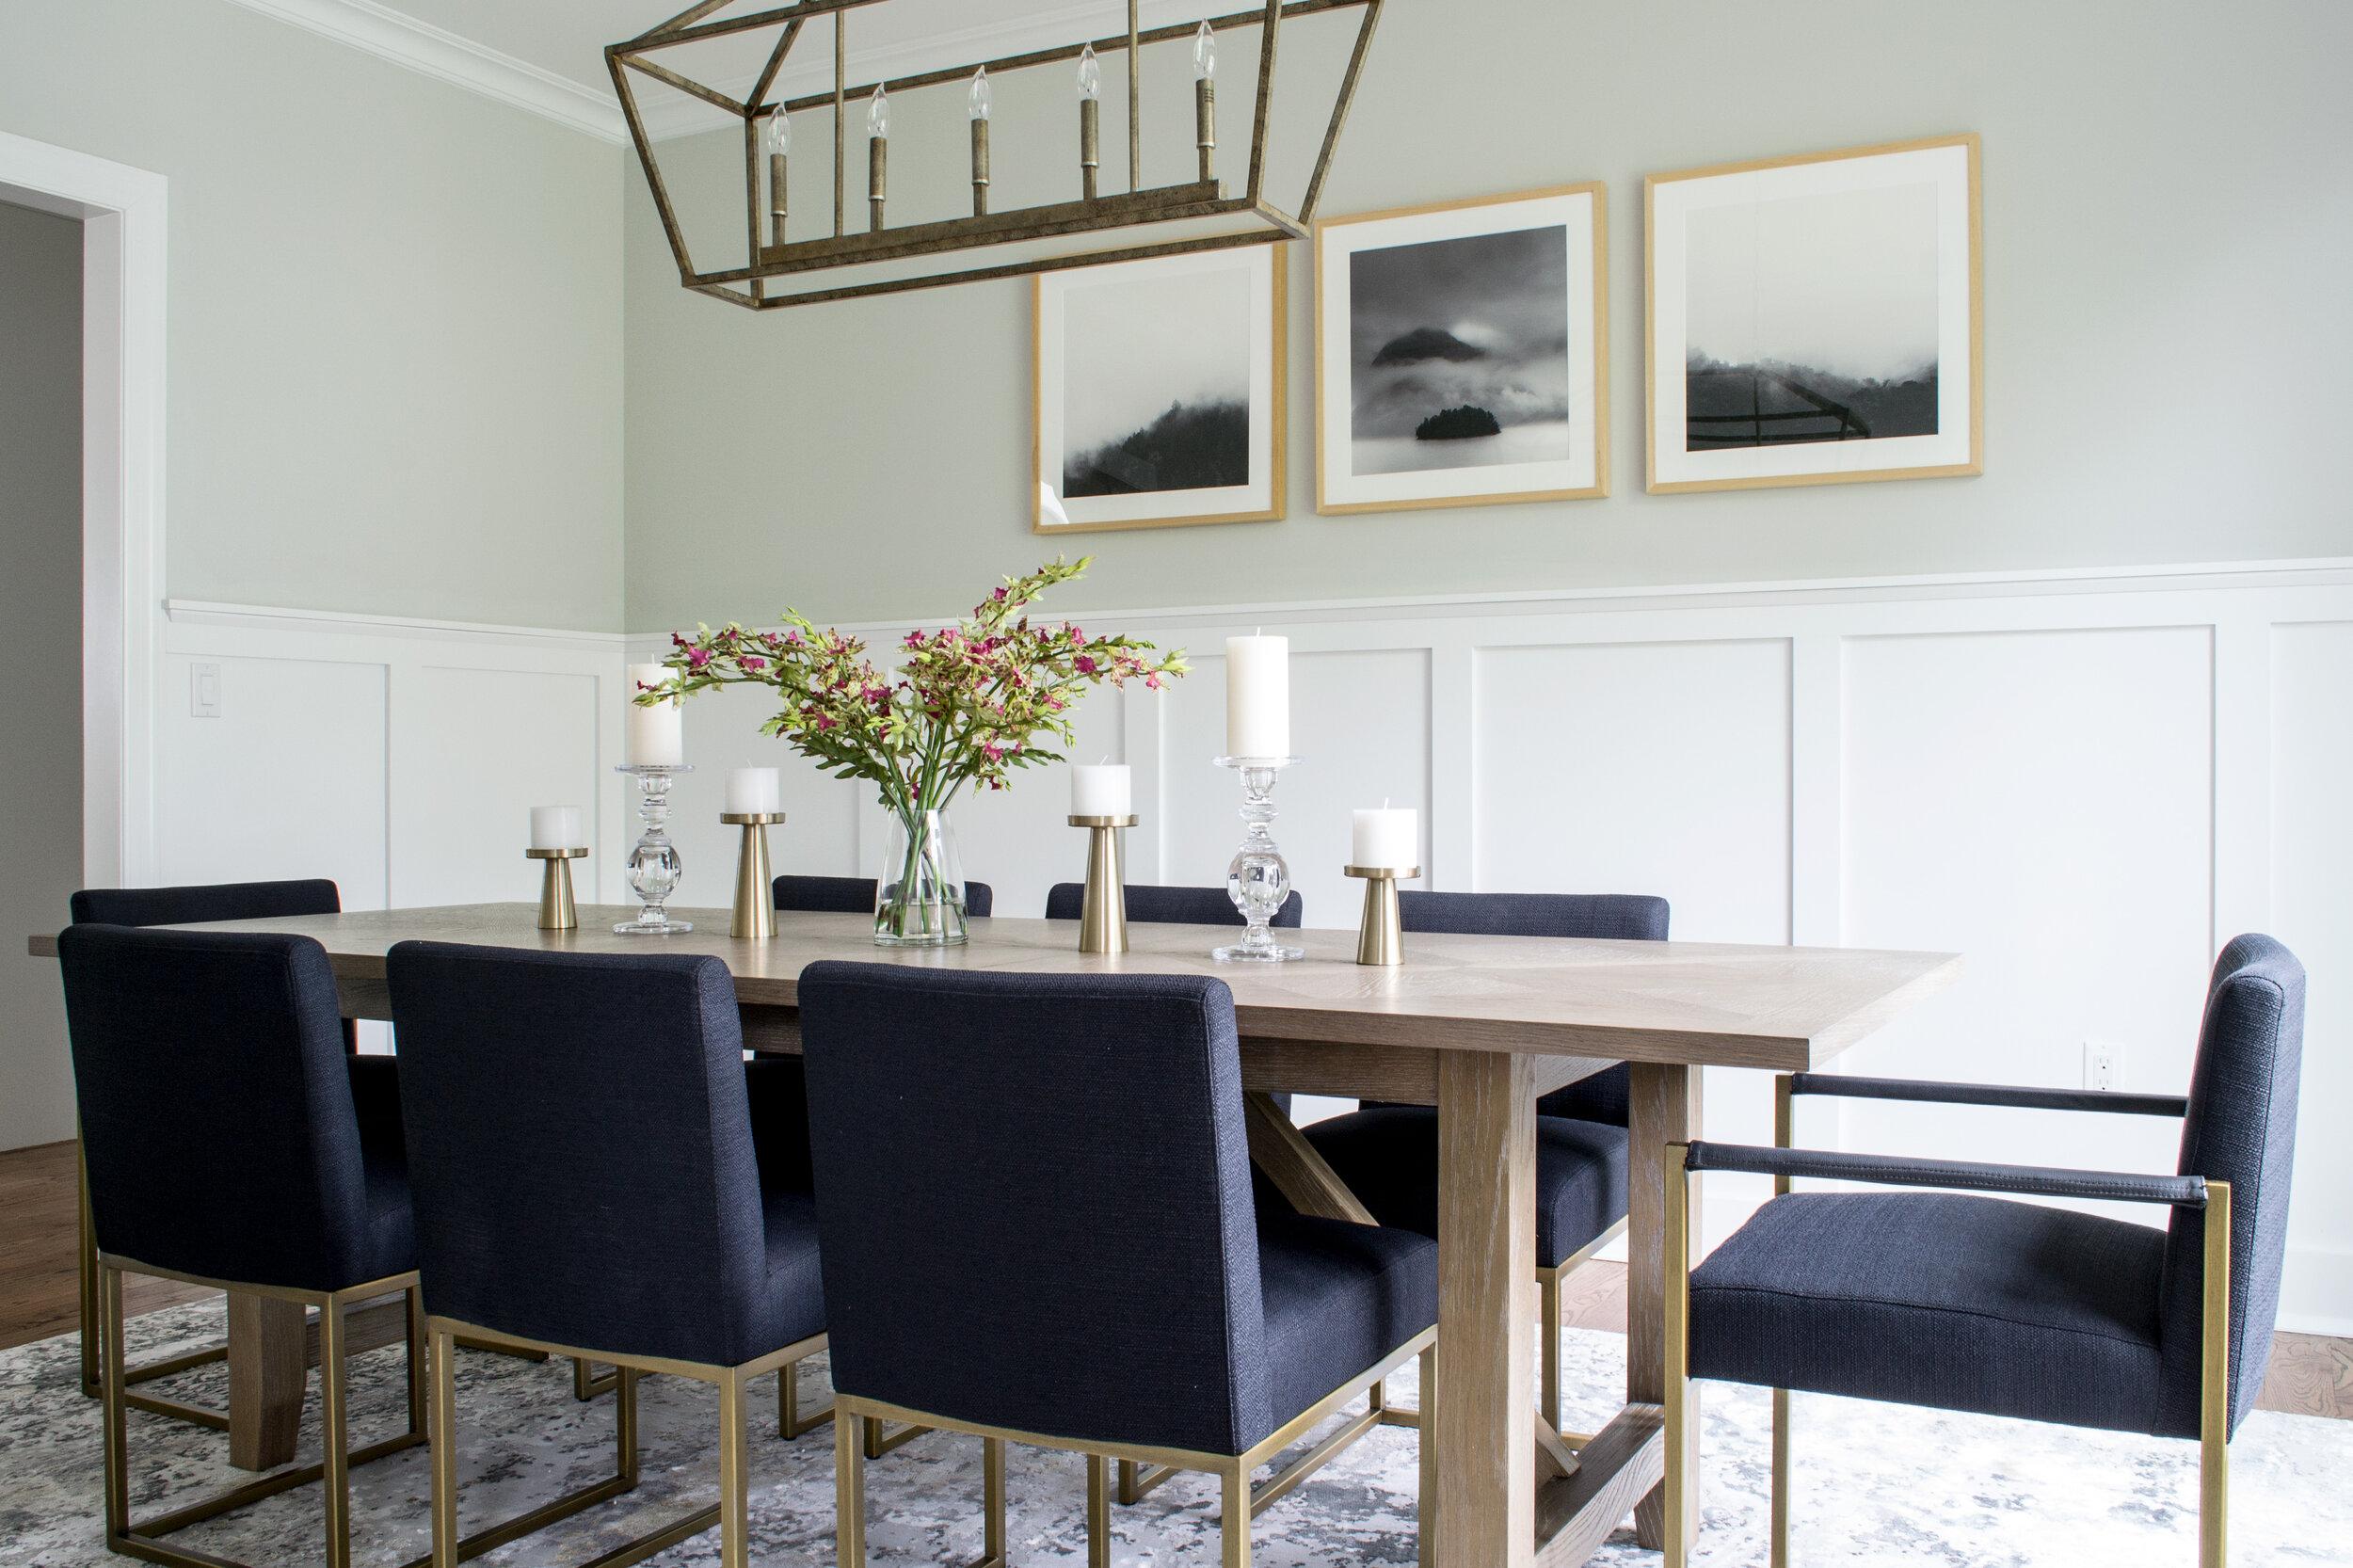 dining-room-contrast-tc-interiors-2.jpeg